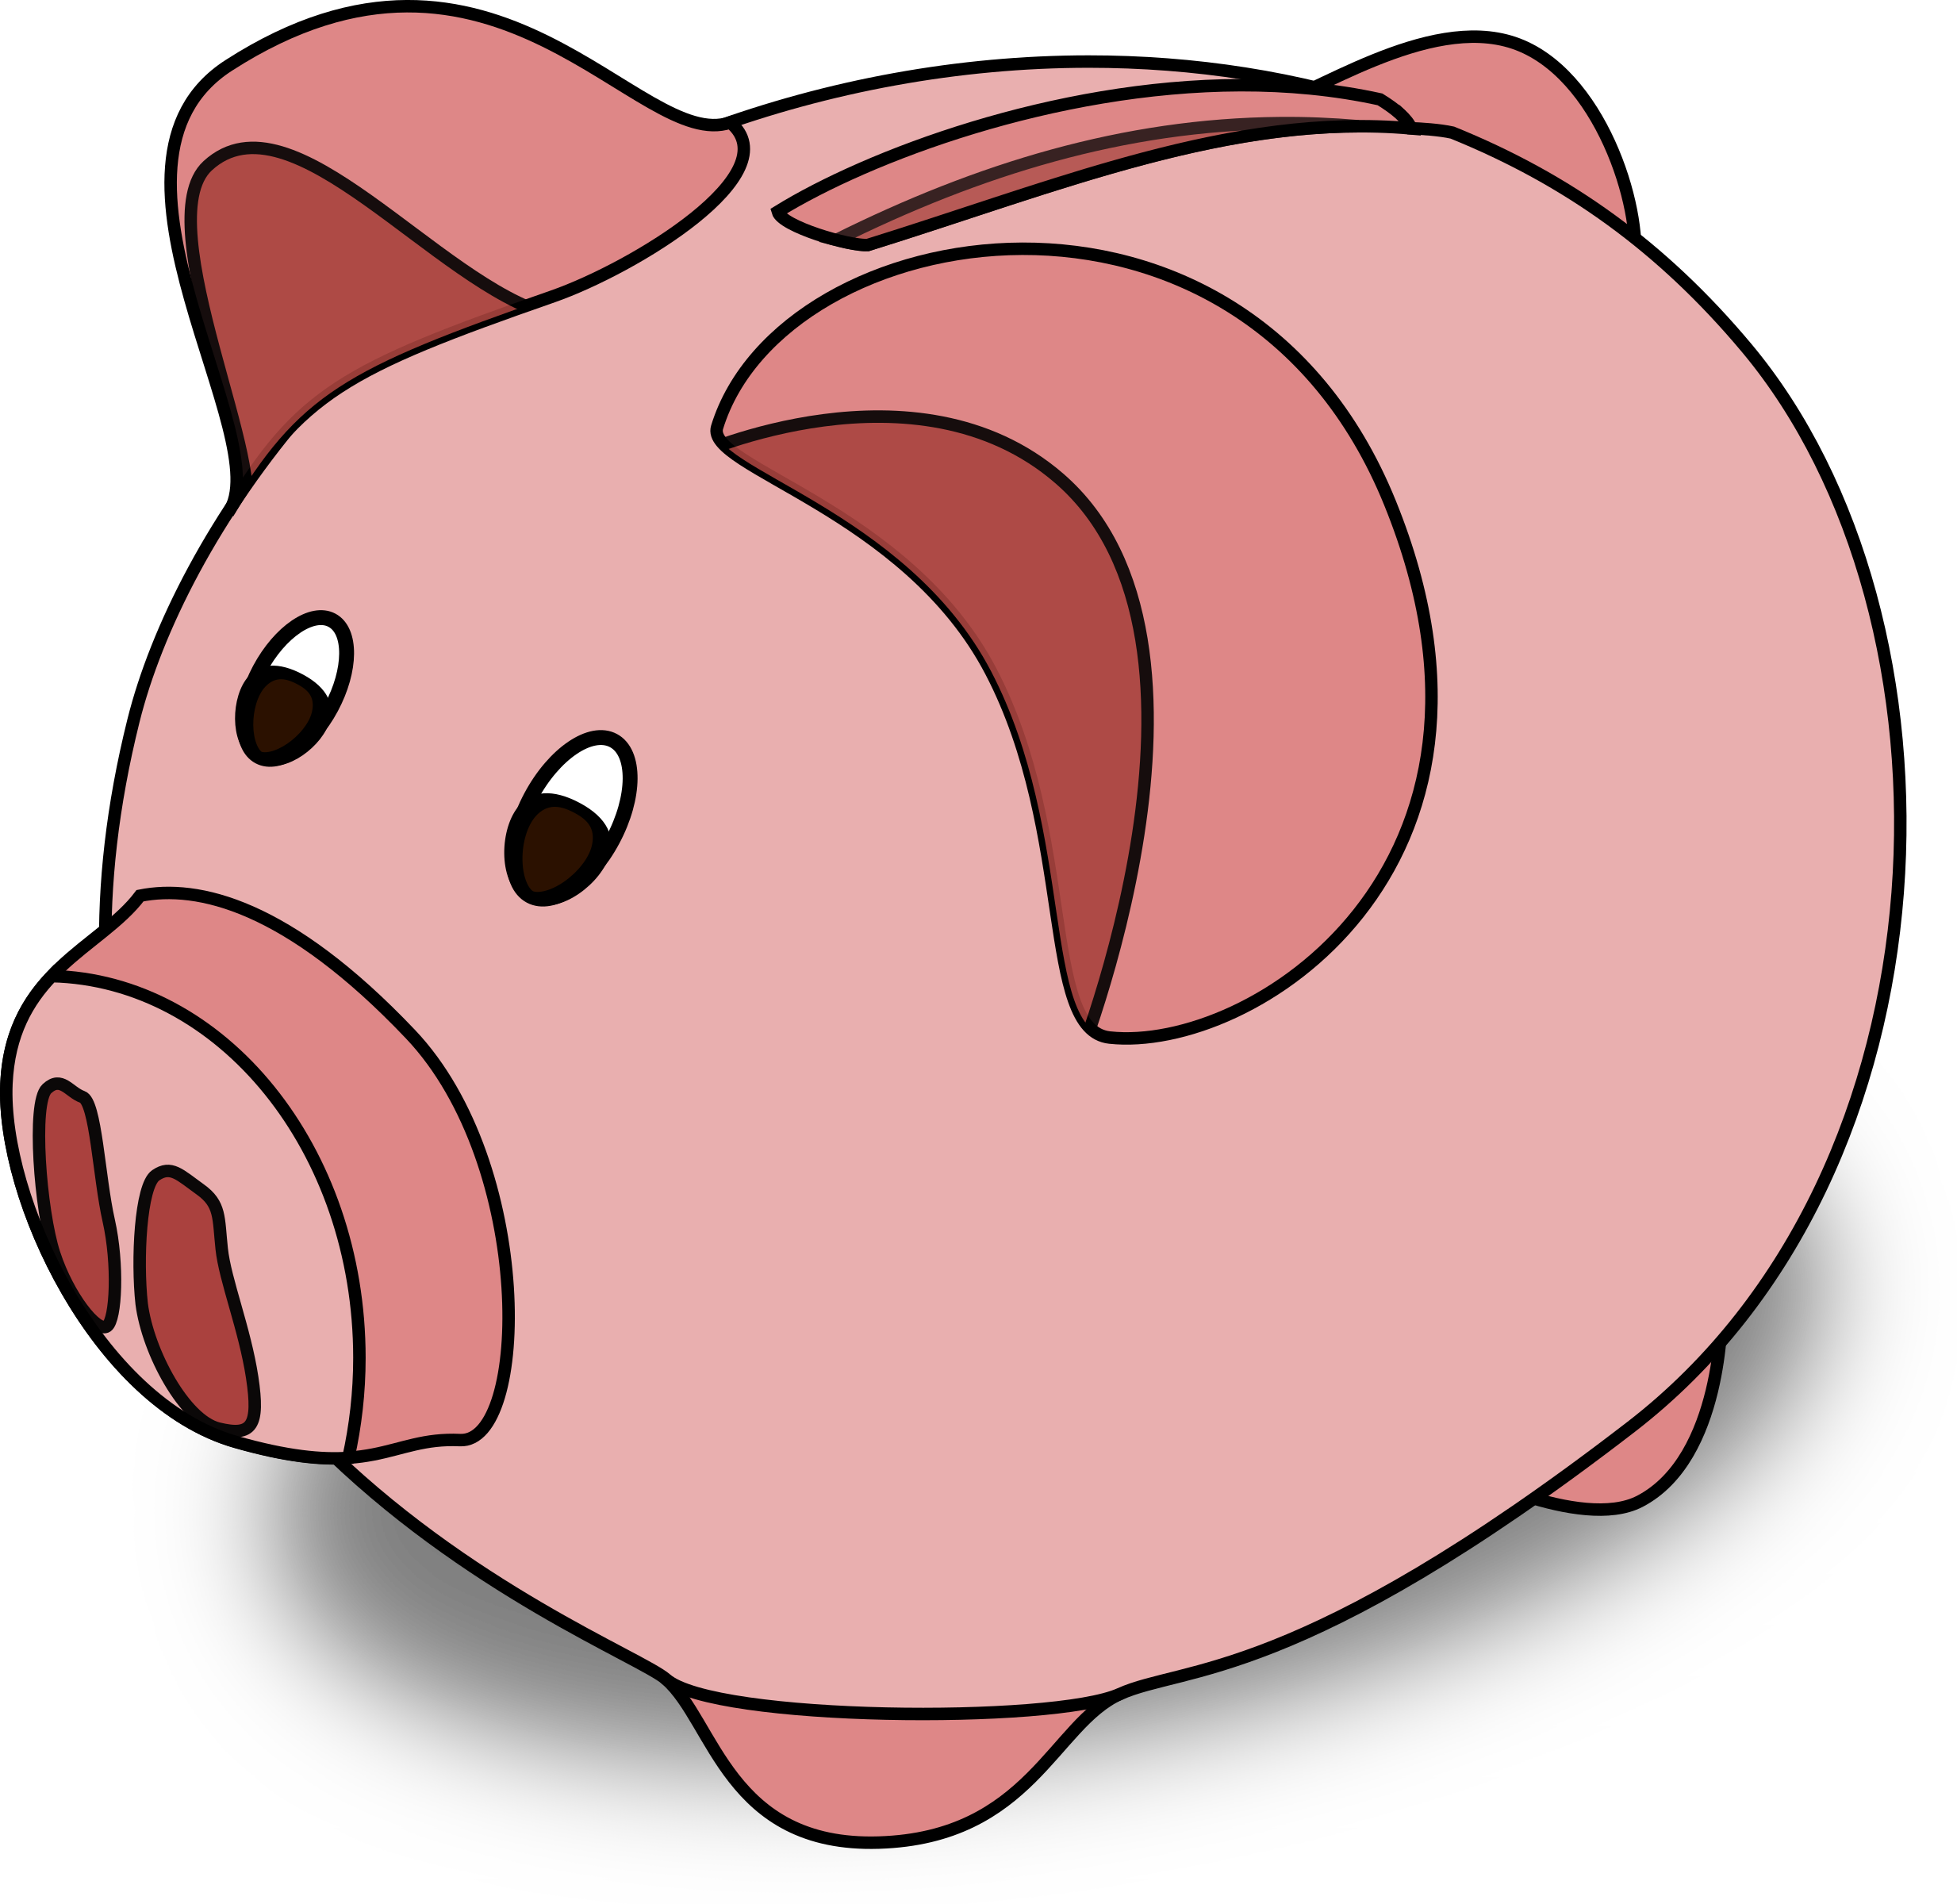 Clipart pig mouth. Cartoon big image png